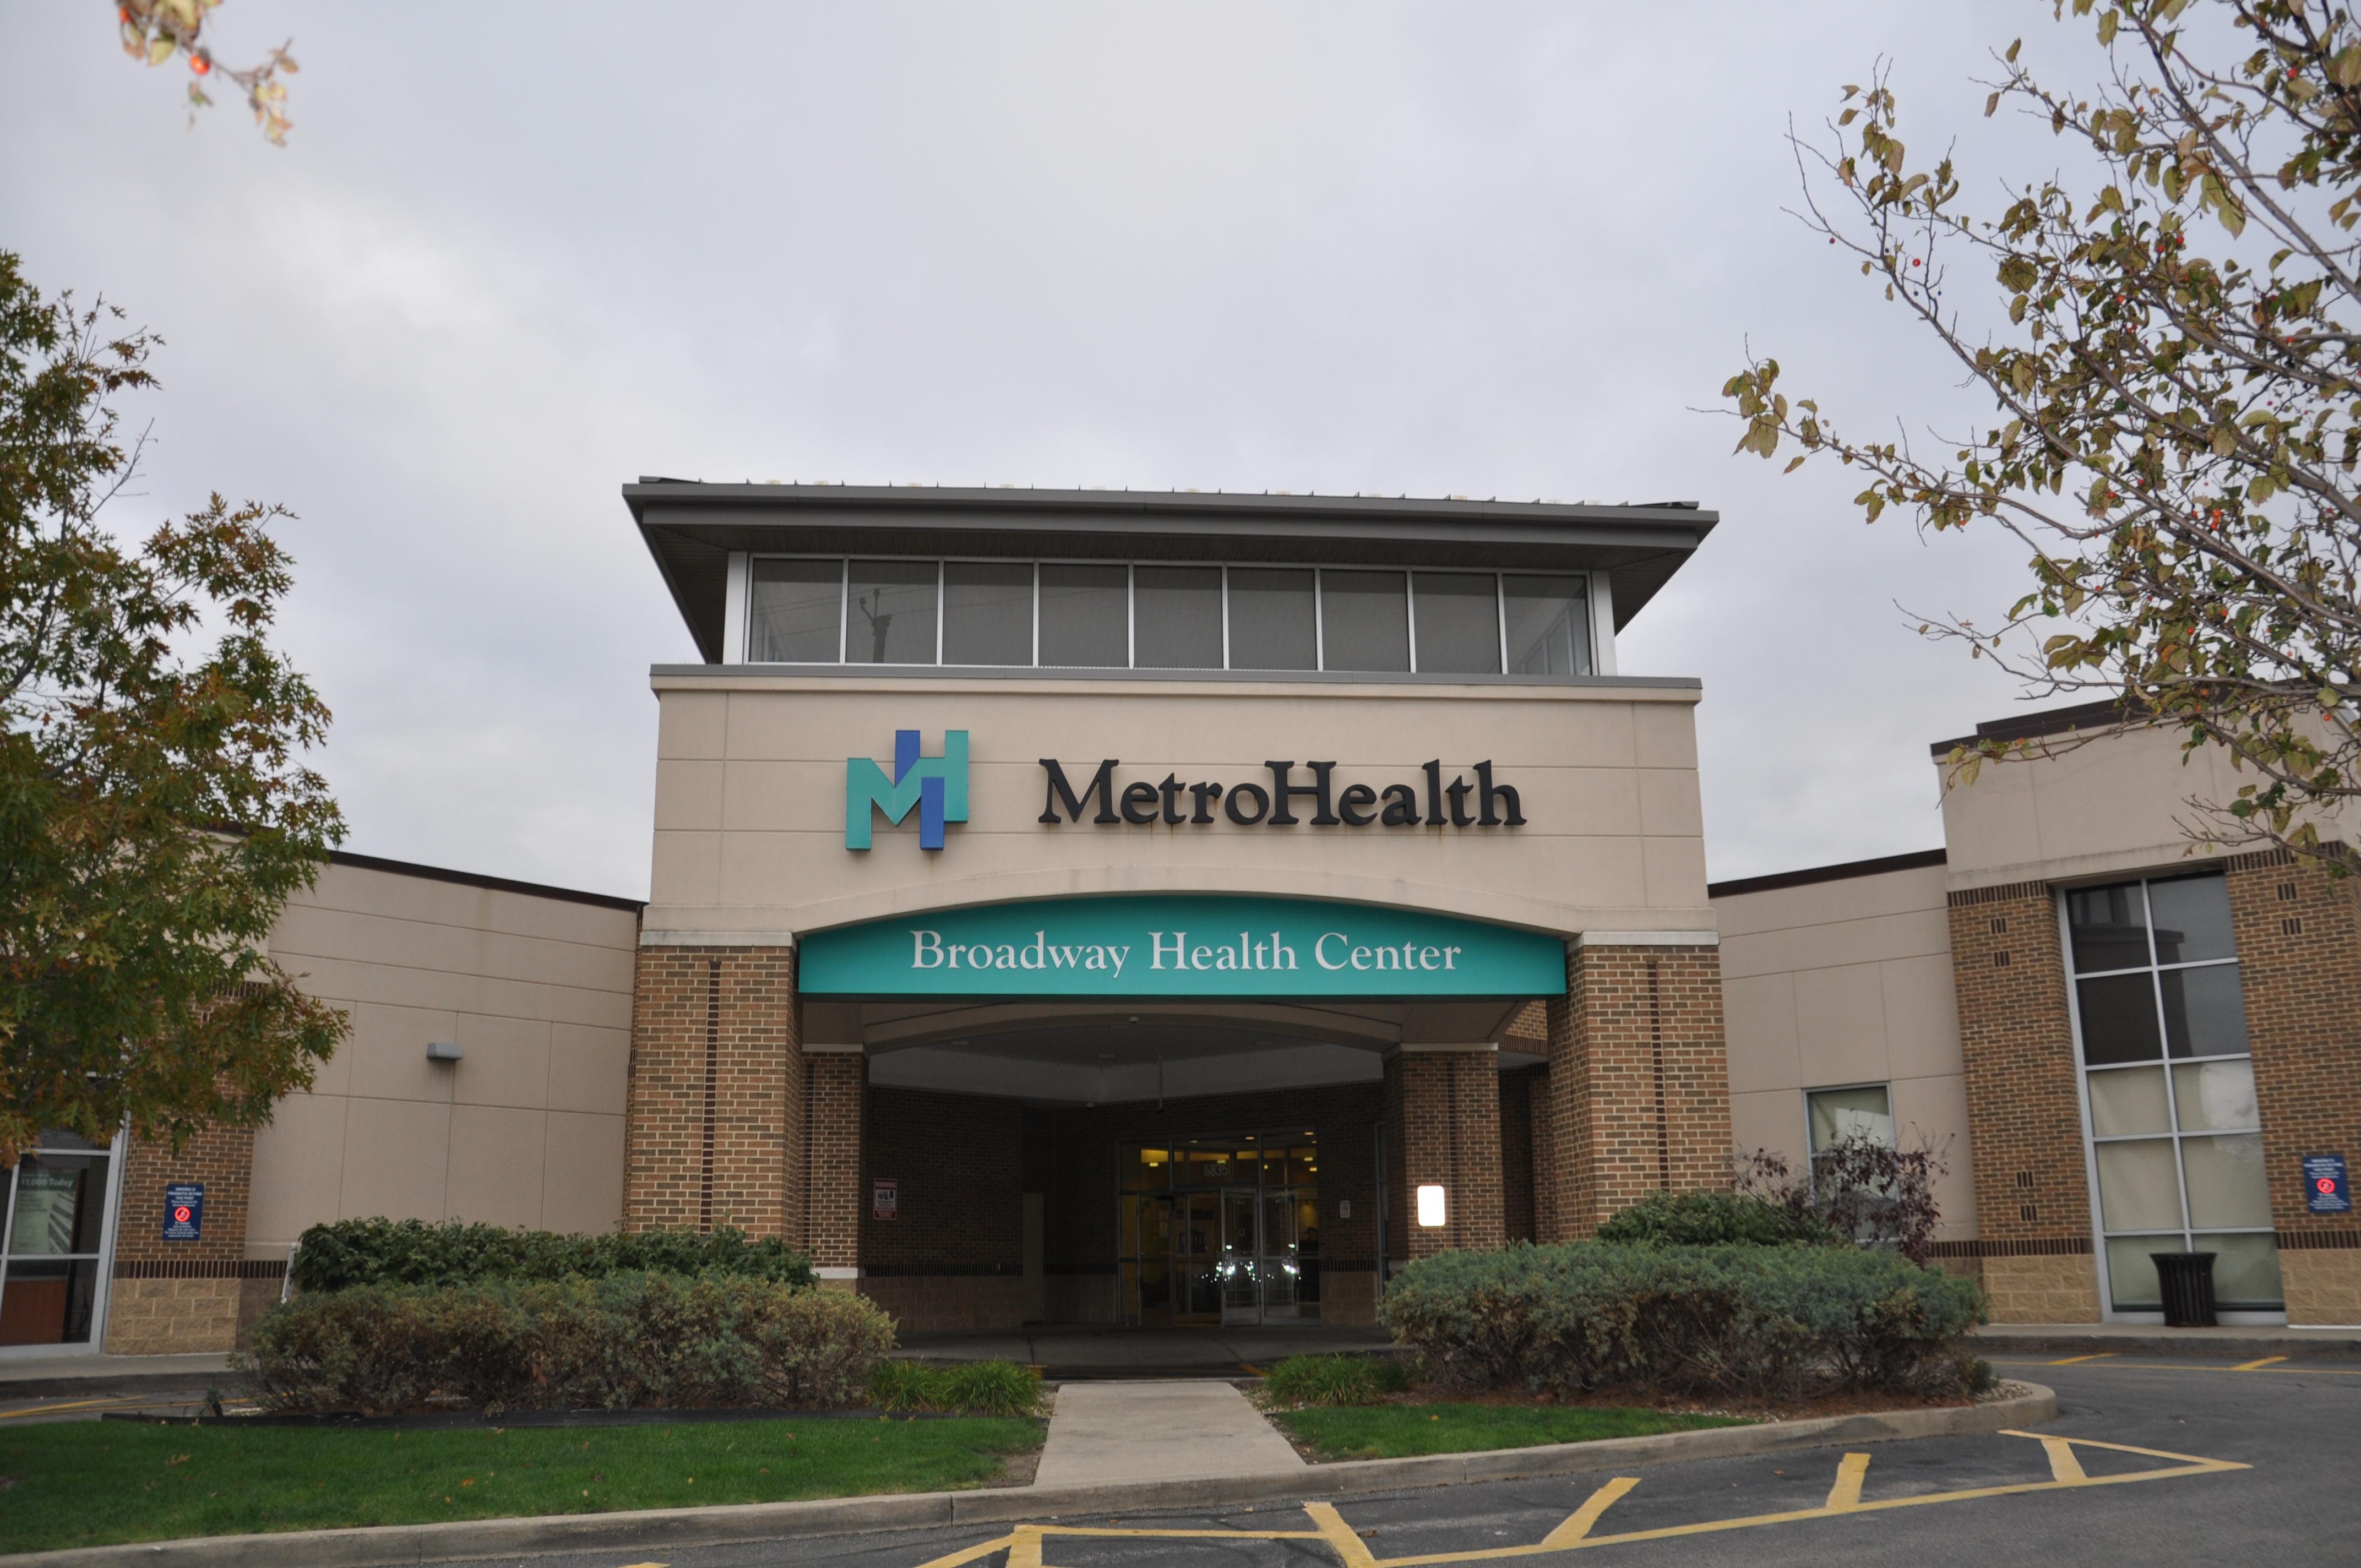 MetroHealth Broadway Health Center - Walk-In Mammography